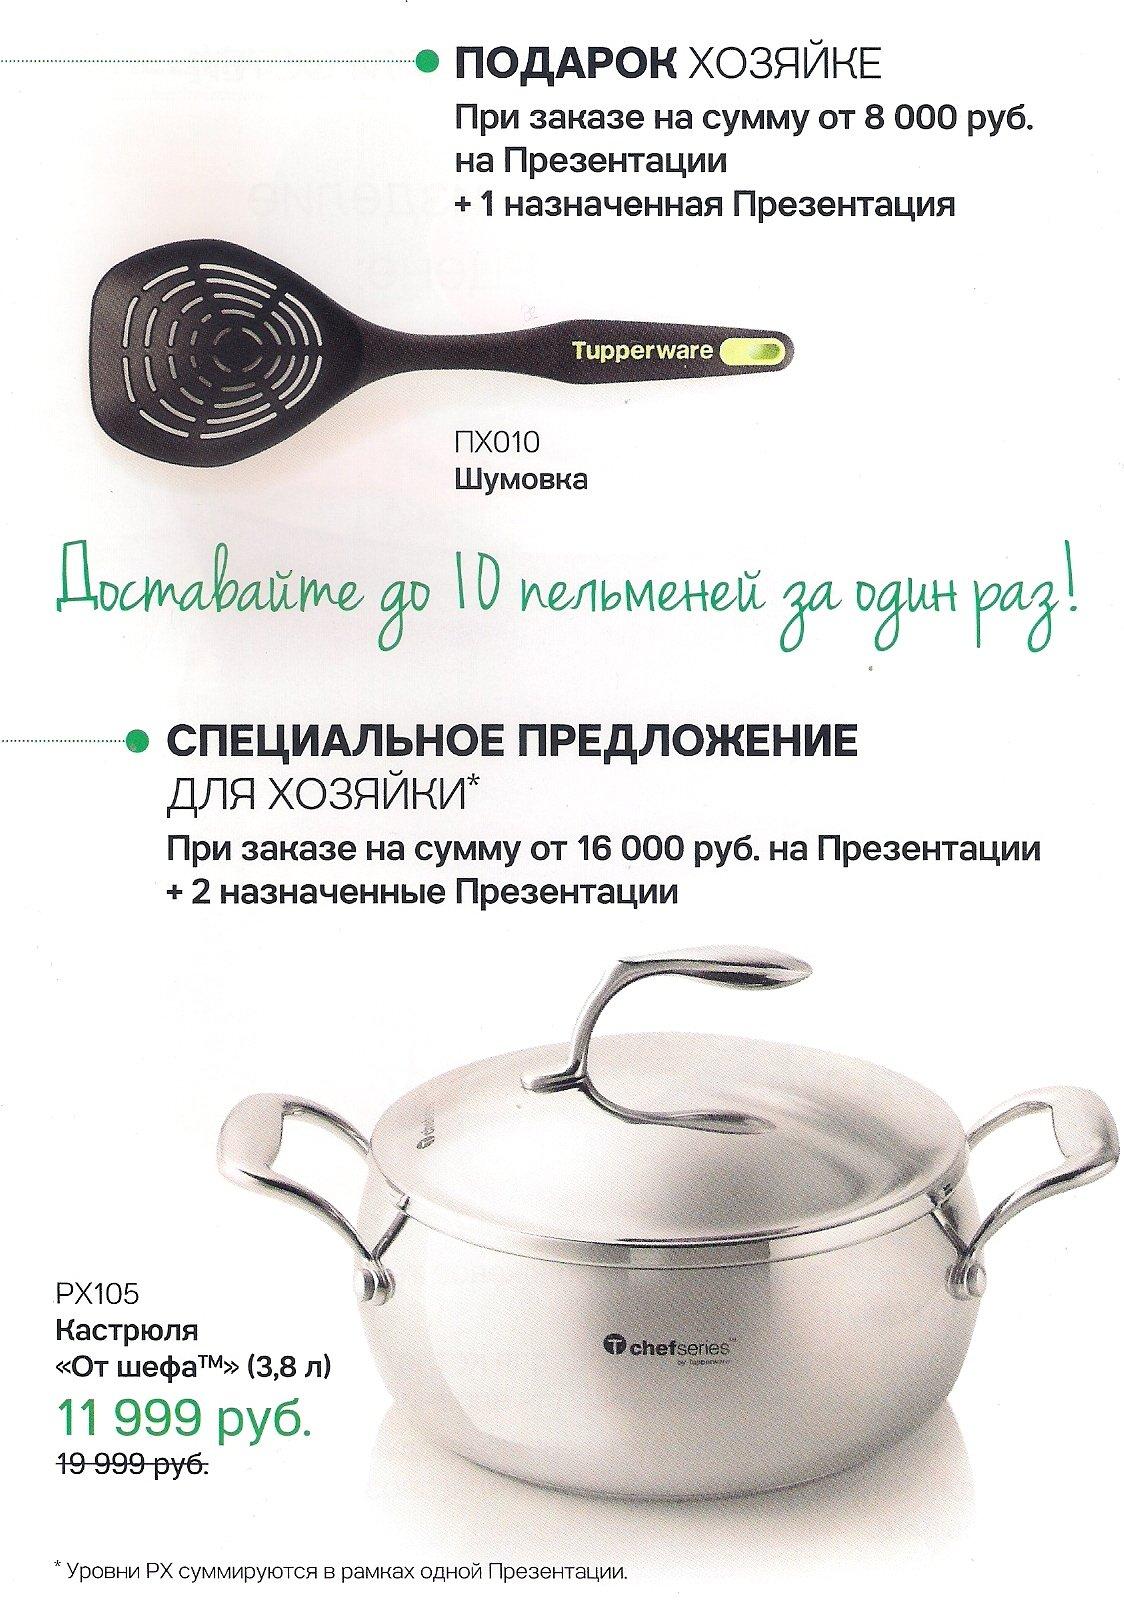 http://tupperware-online.ru/images/upload/2d.jpg